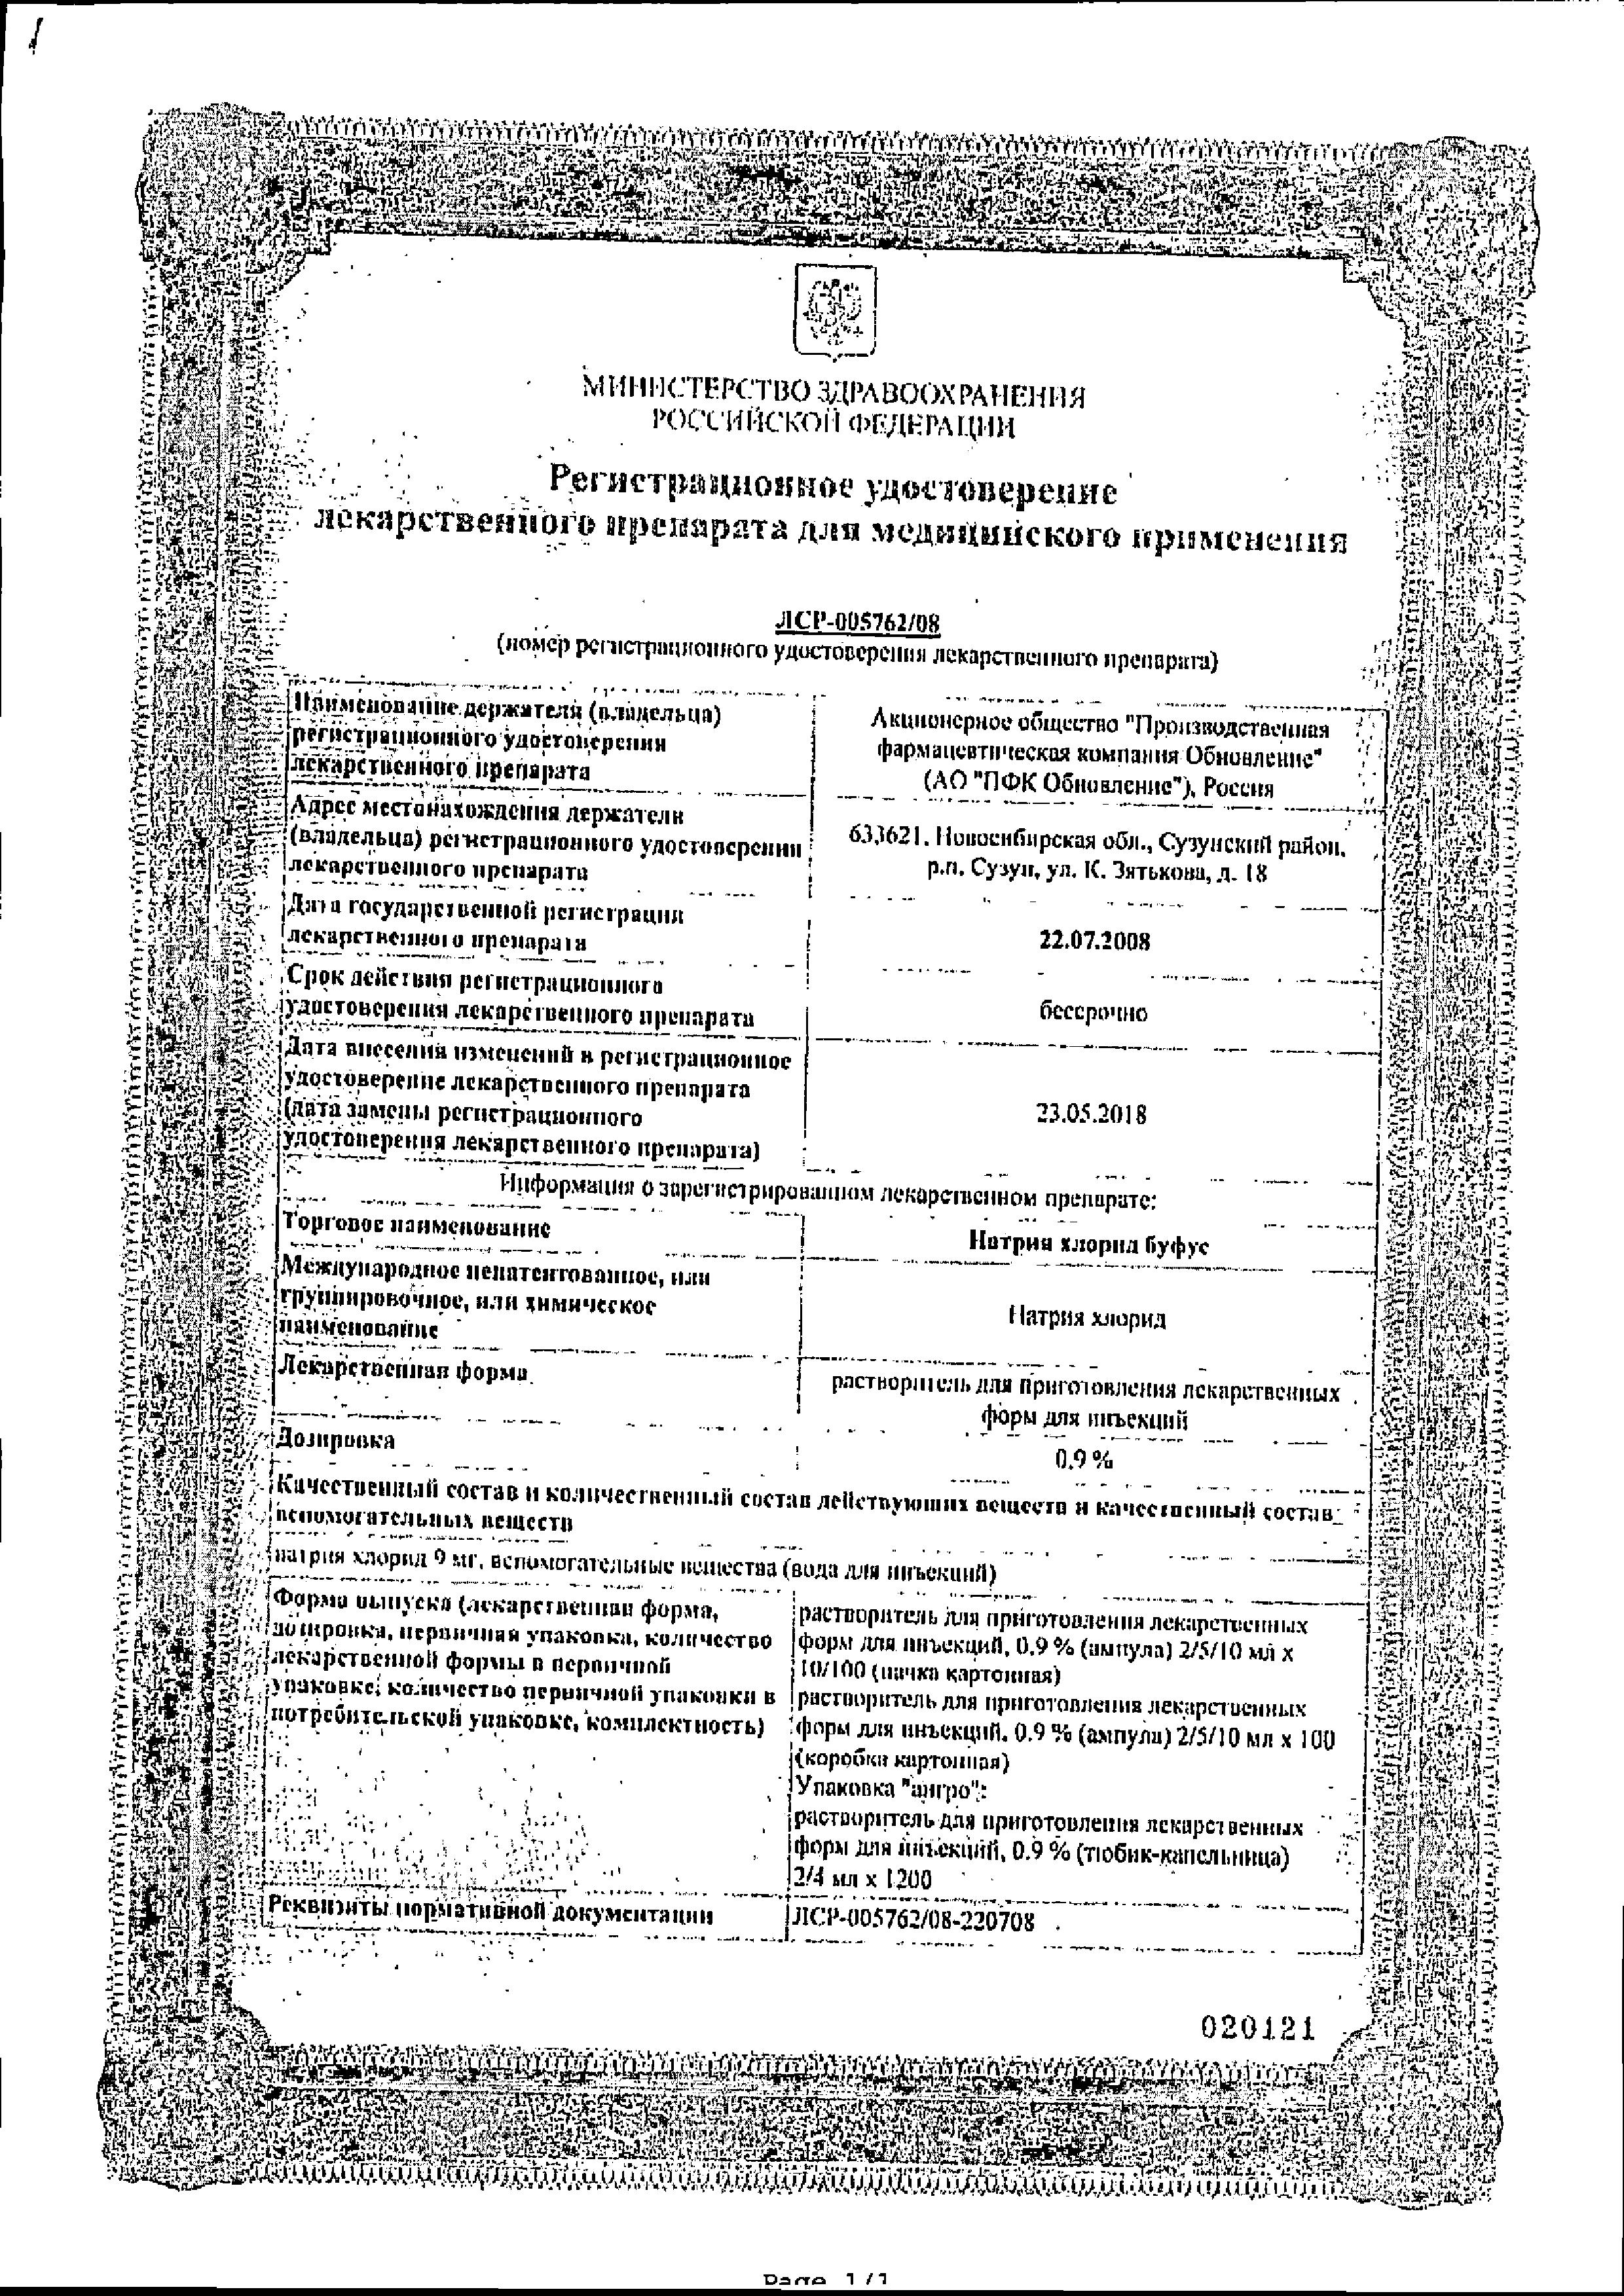 Натрия хлорид сертификат